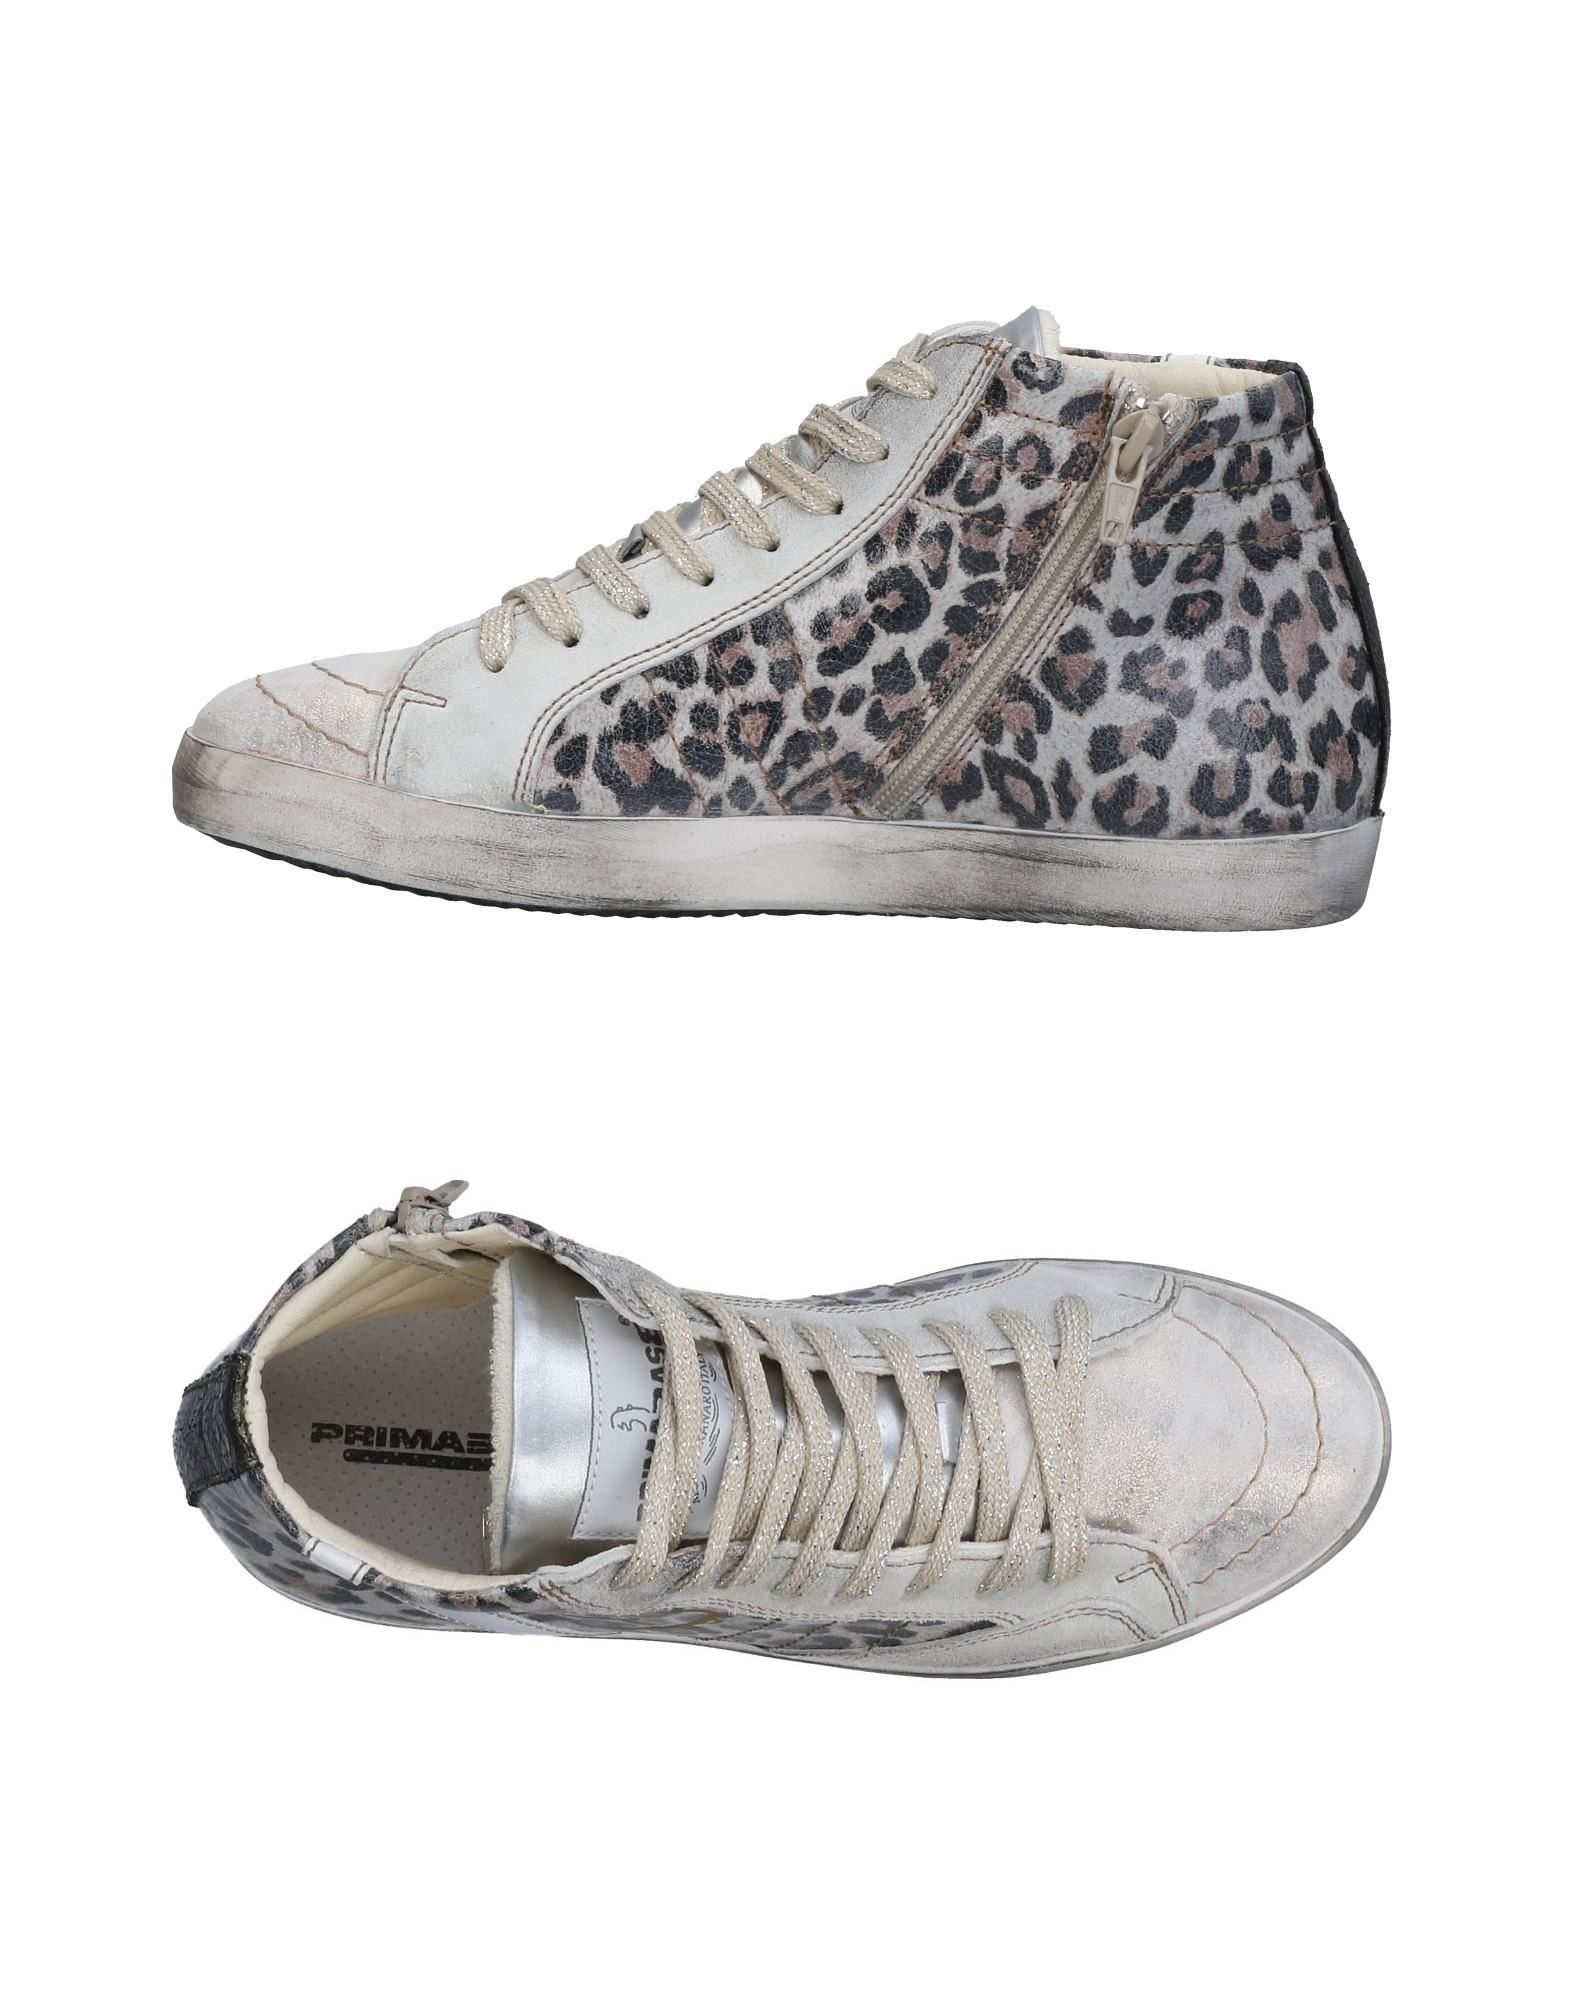 PRIMABASE Высокие кеды и кроссовки кеды кроссовки высокие dc council mid tx stone camo